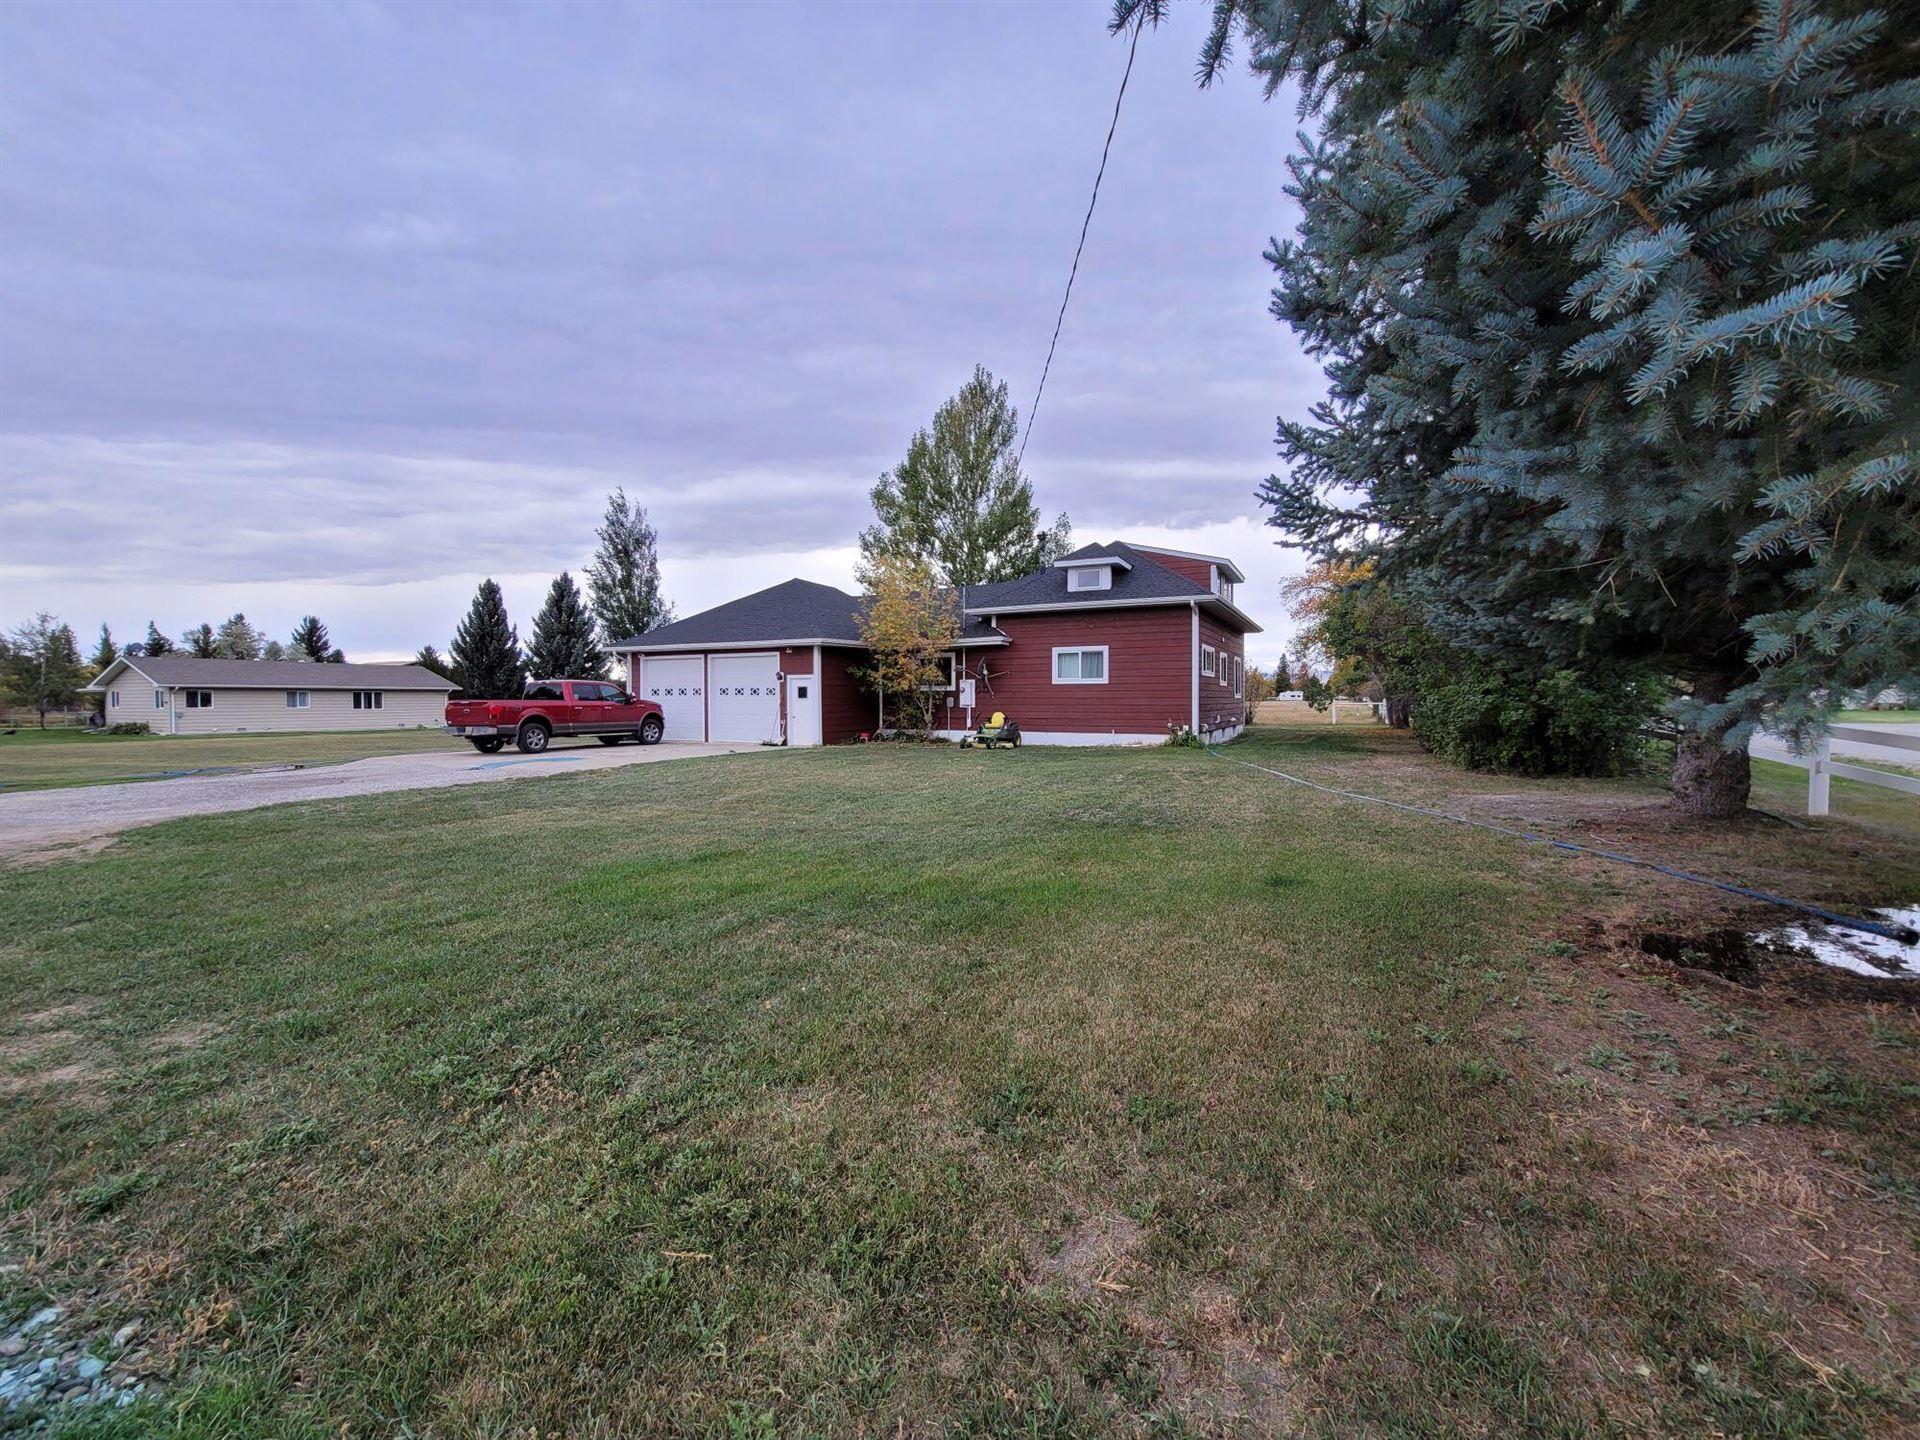 Photo of 600 7th Avenue North West, Choteau, MT 59422 (MLS # 22116464)